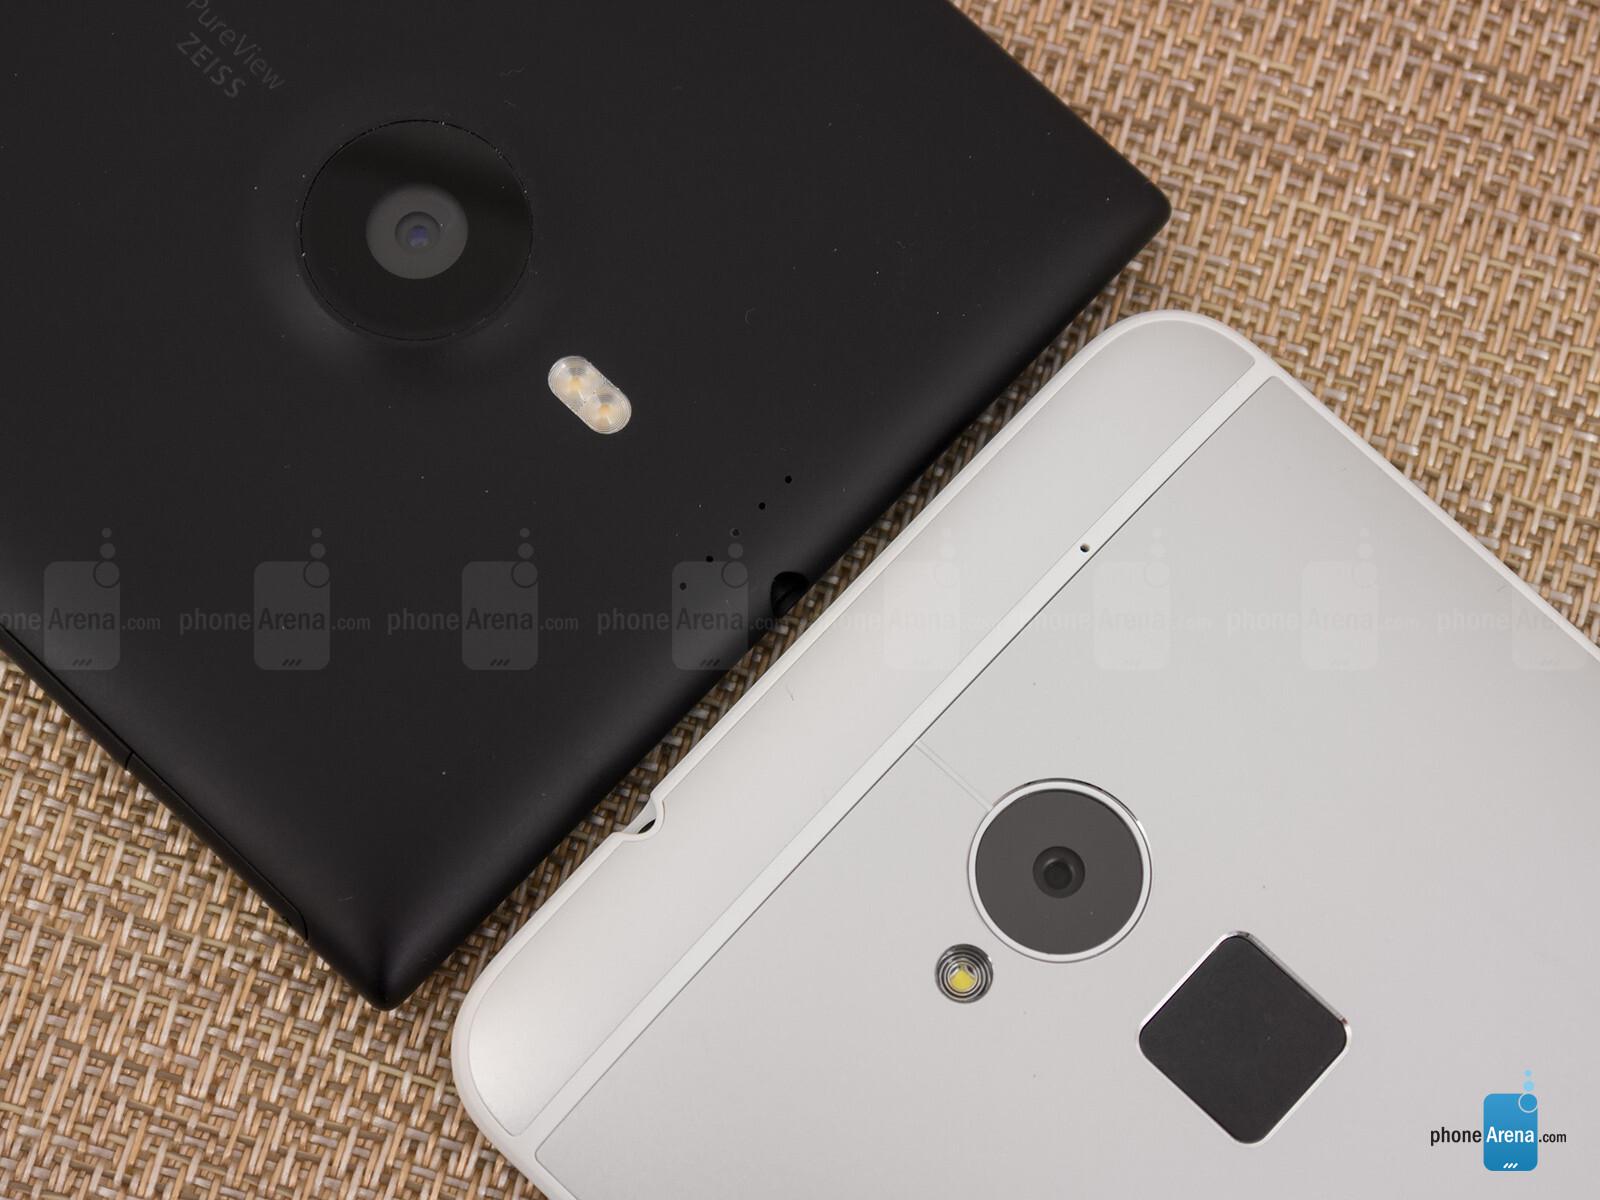 lumia 1520 vs htc one max seems